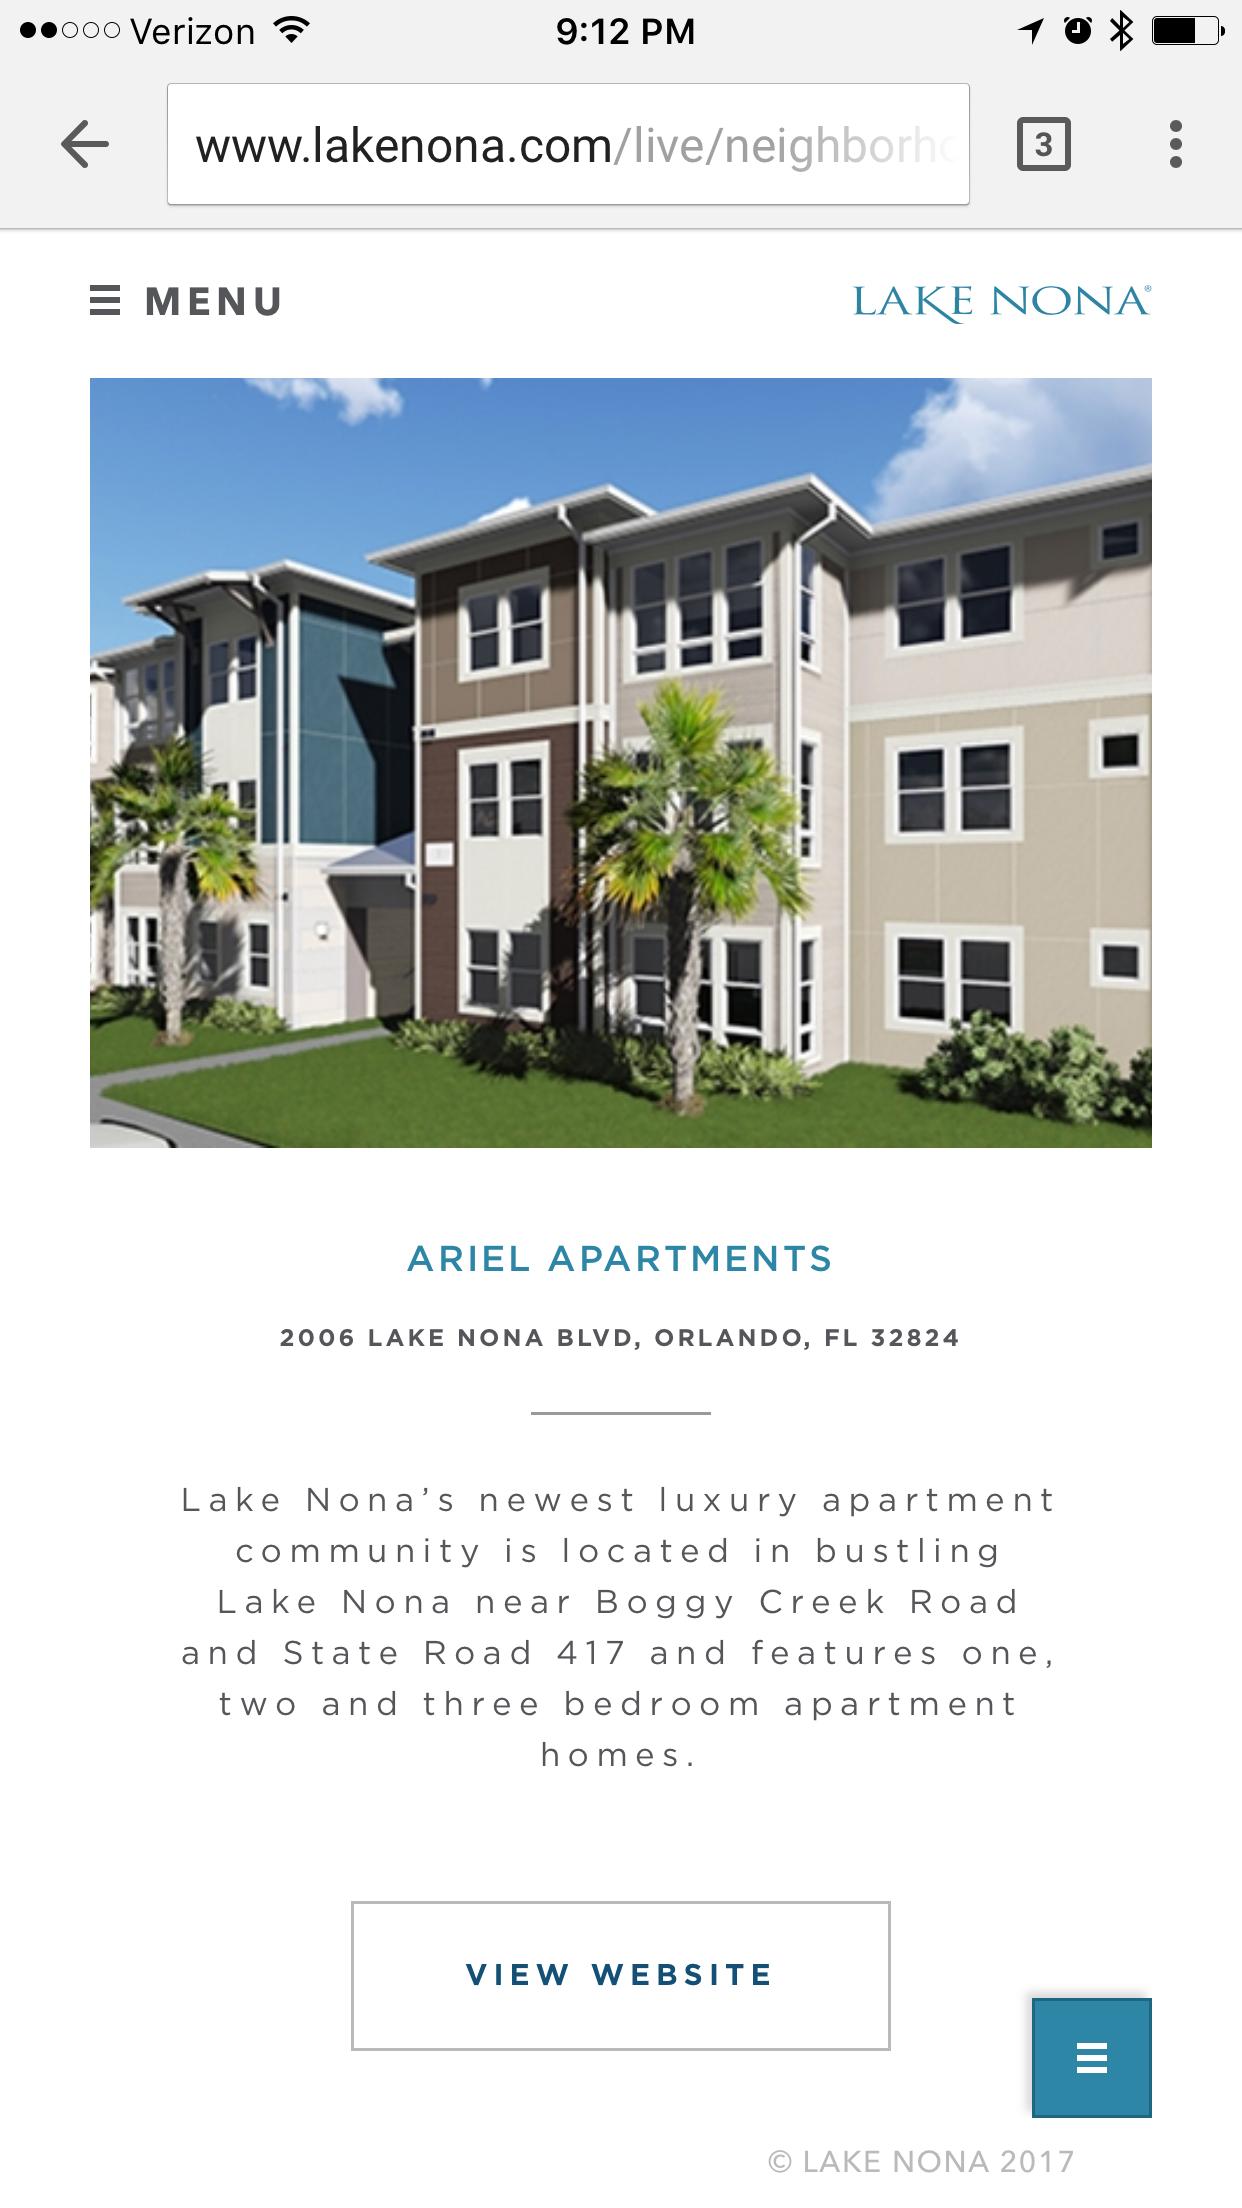 Ariel Apartments brand new apartments in Lake Nona Orlando FL